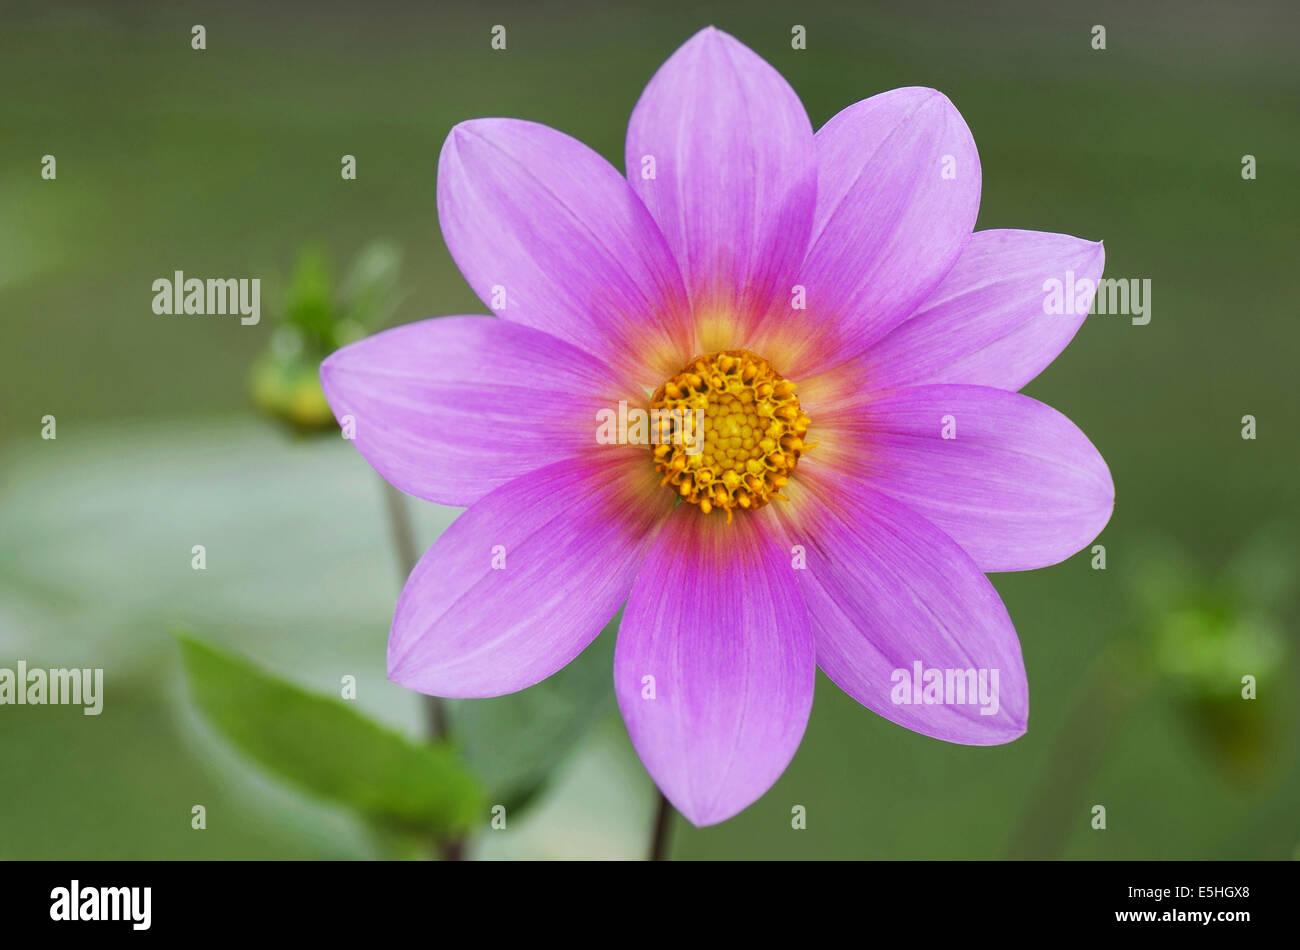 Pink Dahlia, Harish-Chandra Research Institute Campus, Allahabad, Uttar Pradesh, India - Stock Image